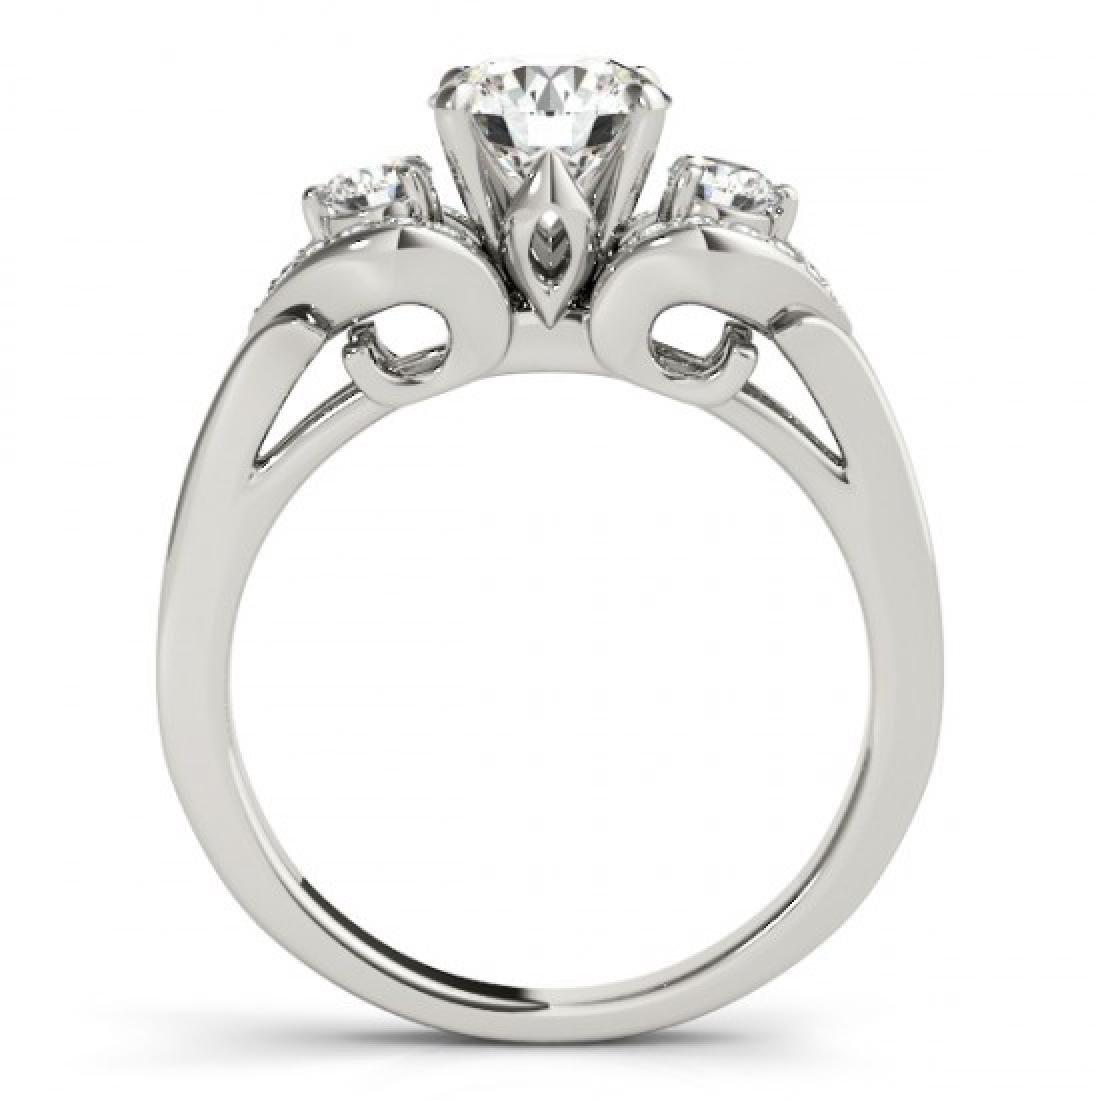 1.2 CTW Certified VS/SI Diamond 3 Stone Ring 14K White - 2